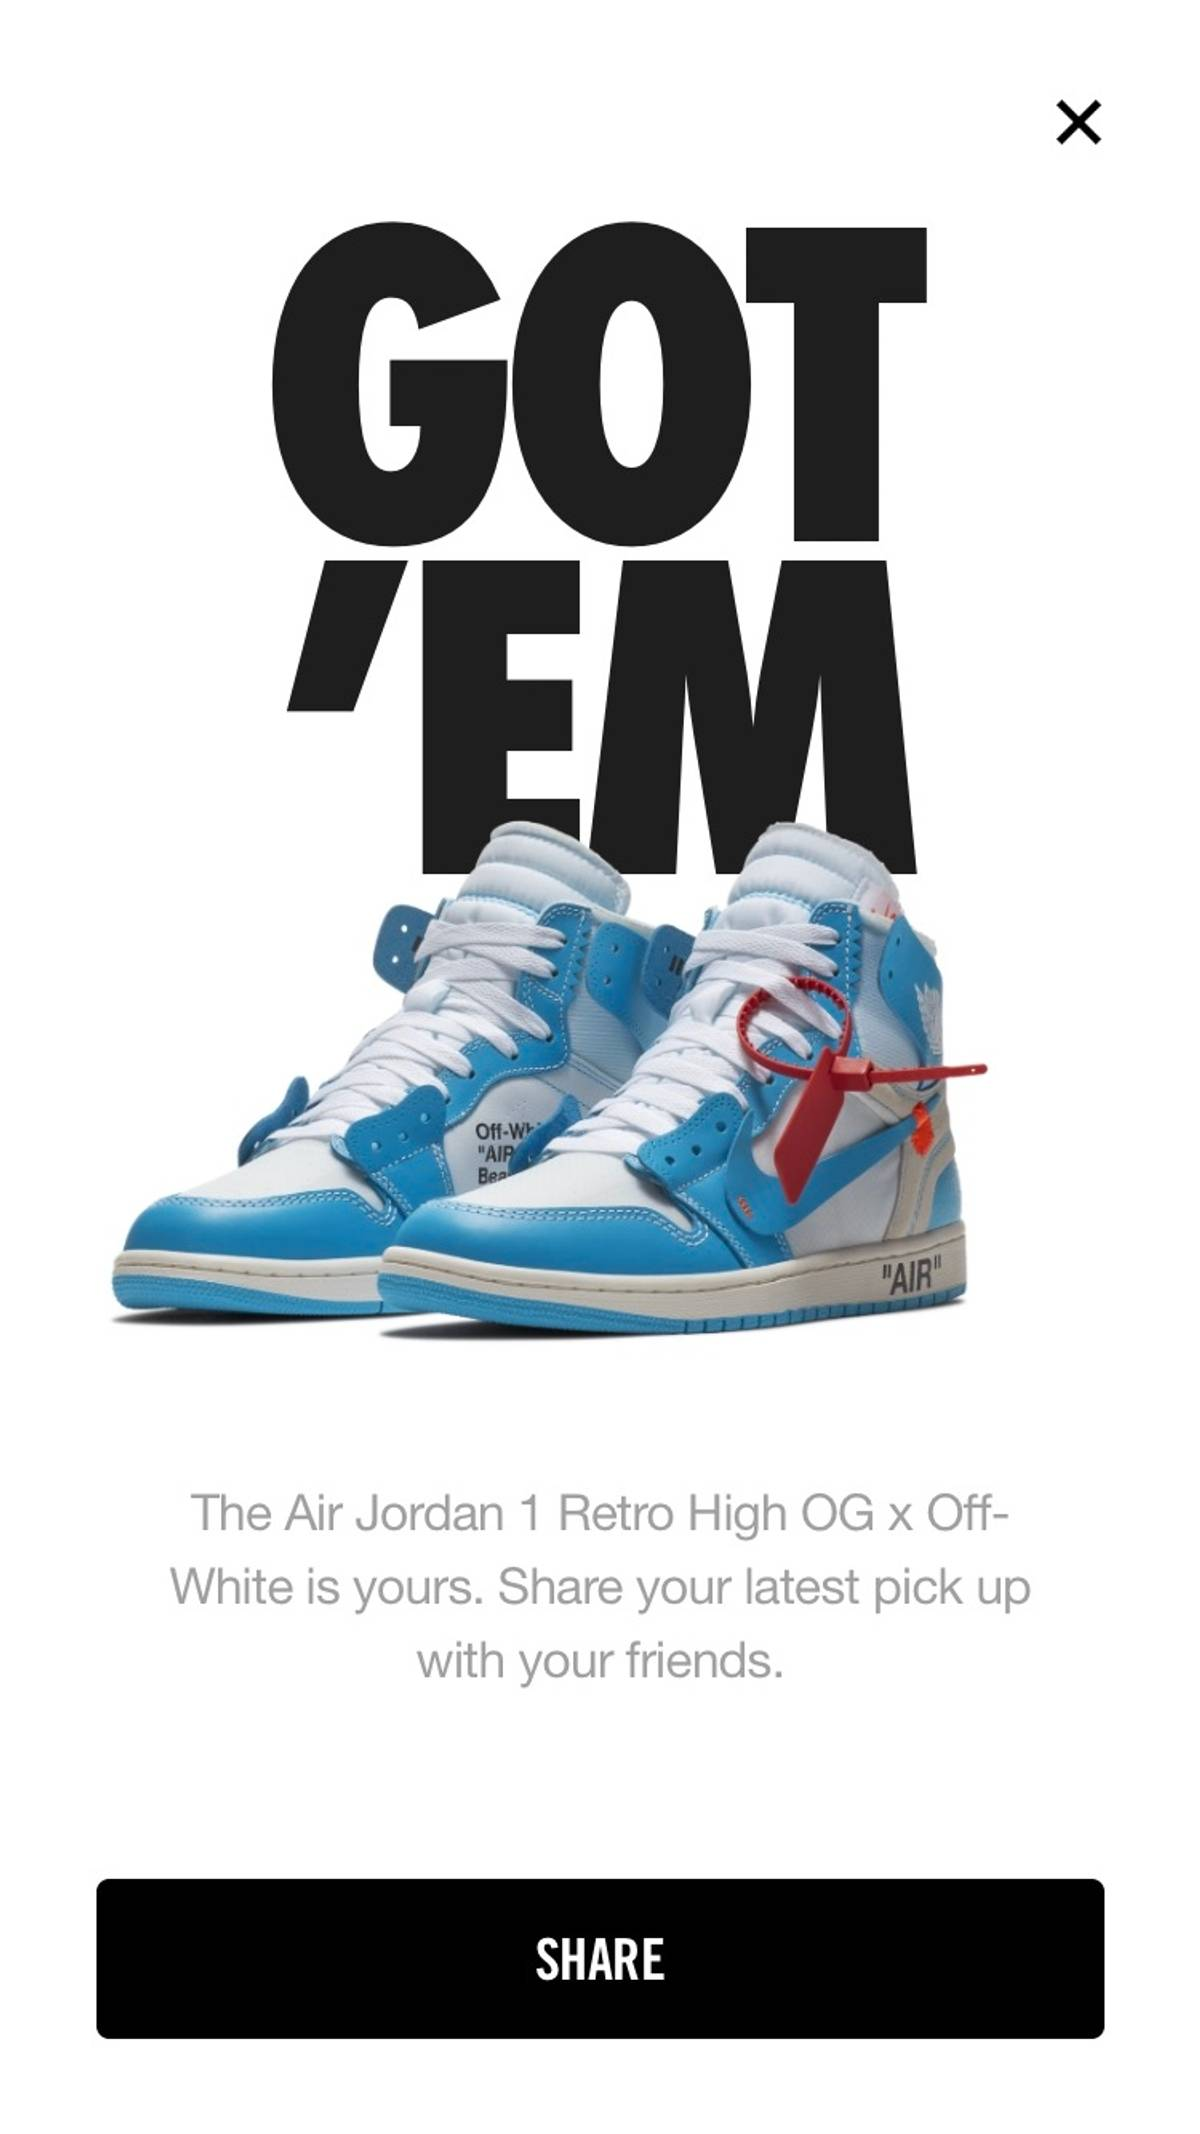 44e7eb6be1a3 Nike Off-White Air Jordan 1